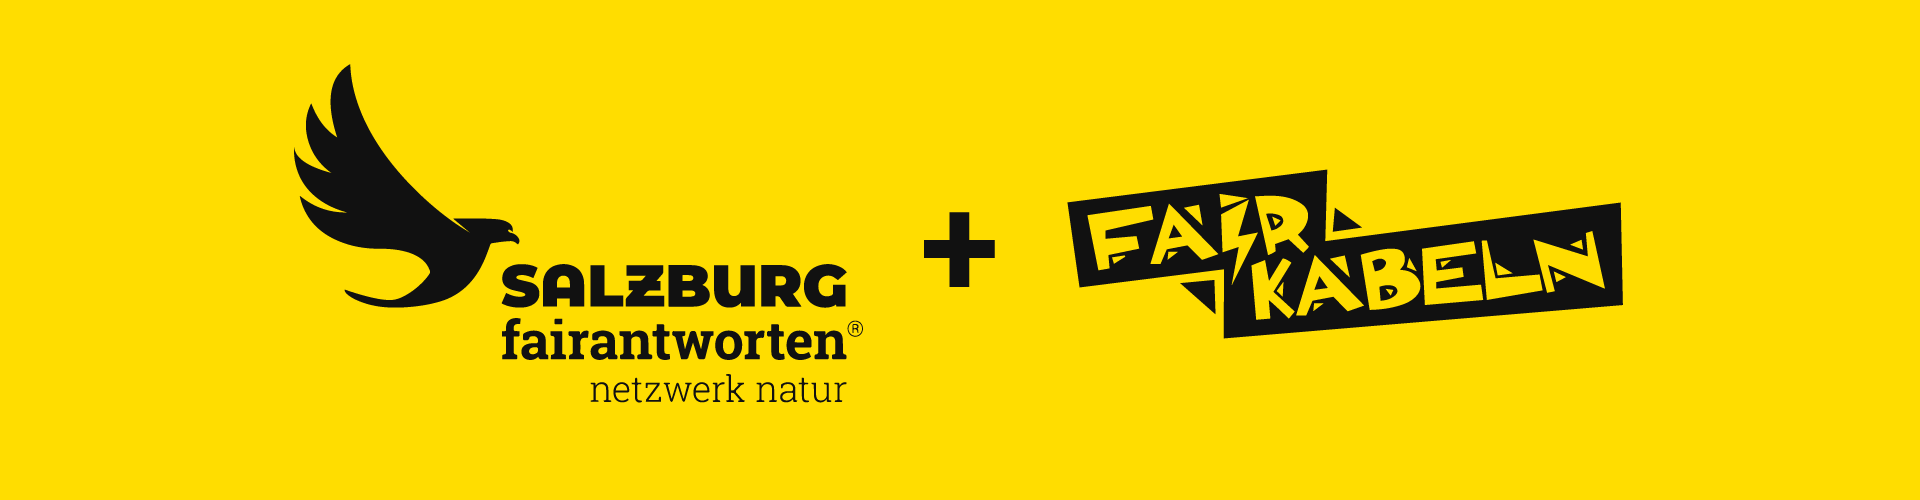 Fairantworten + Fairkabeln Logos